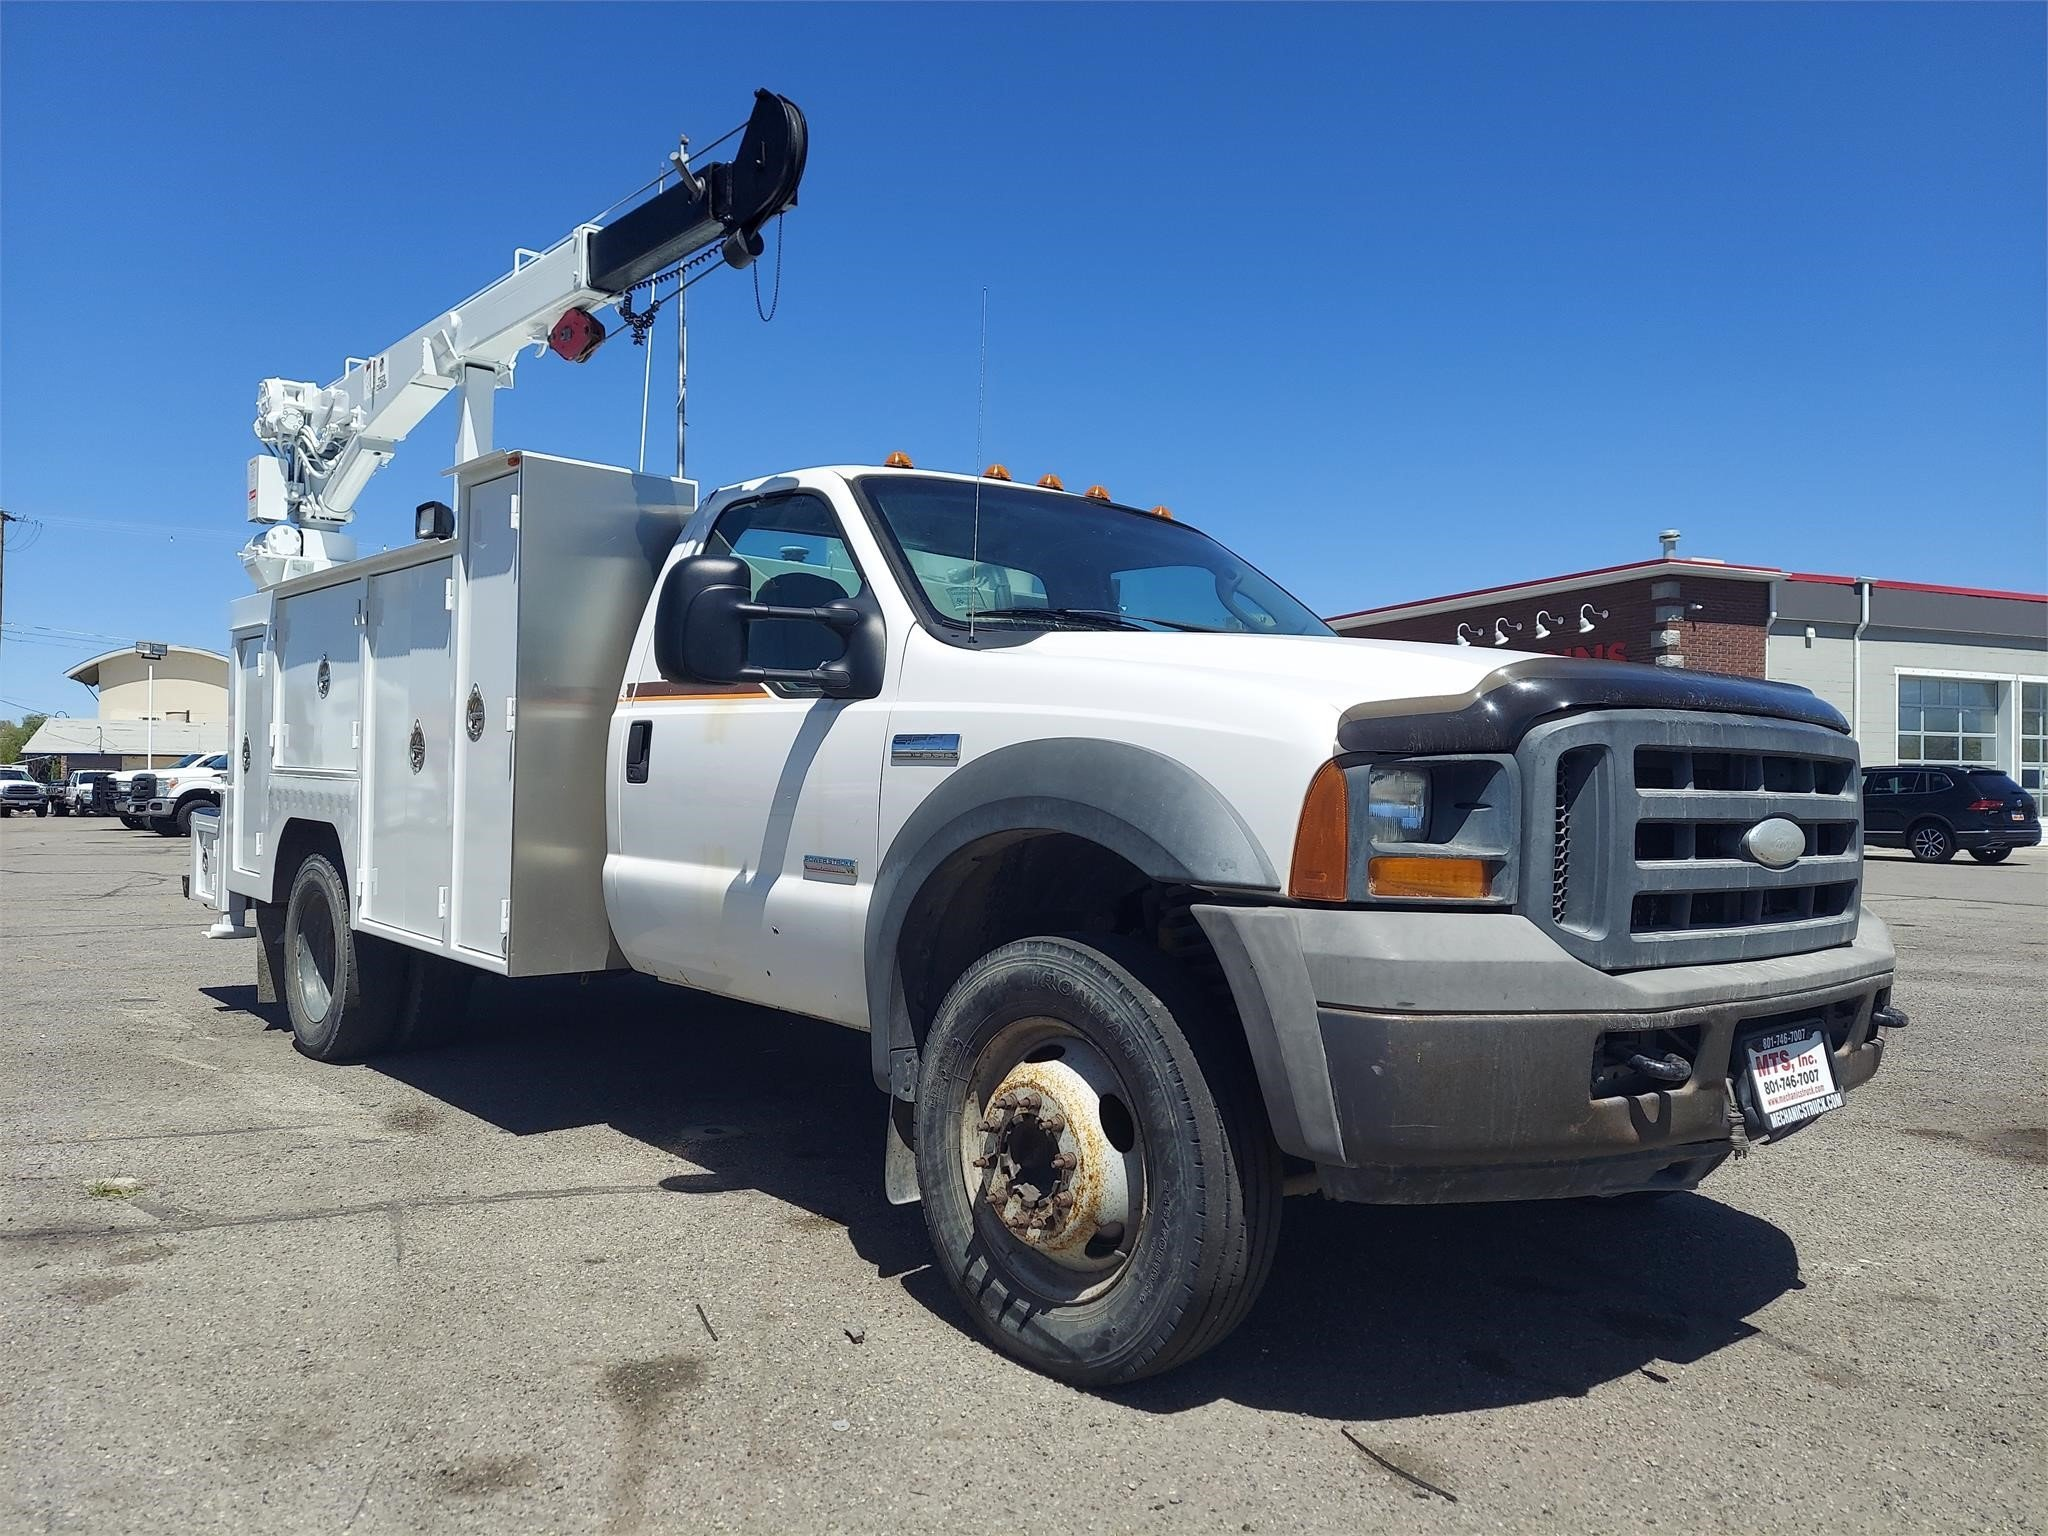 Used, 2005, FORD, F550, Crane Truck